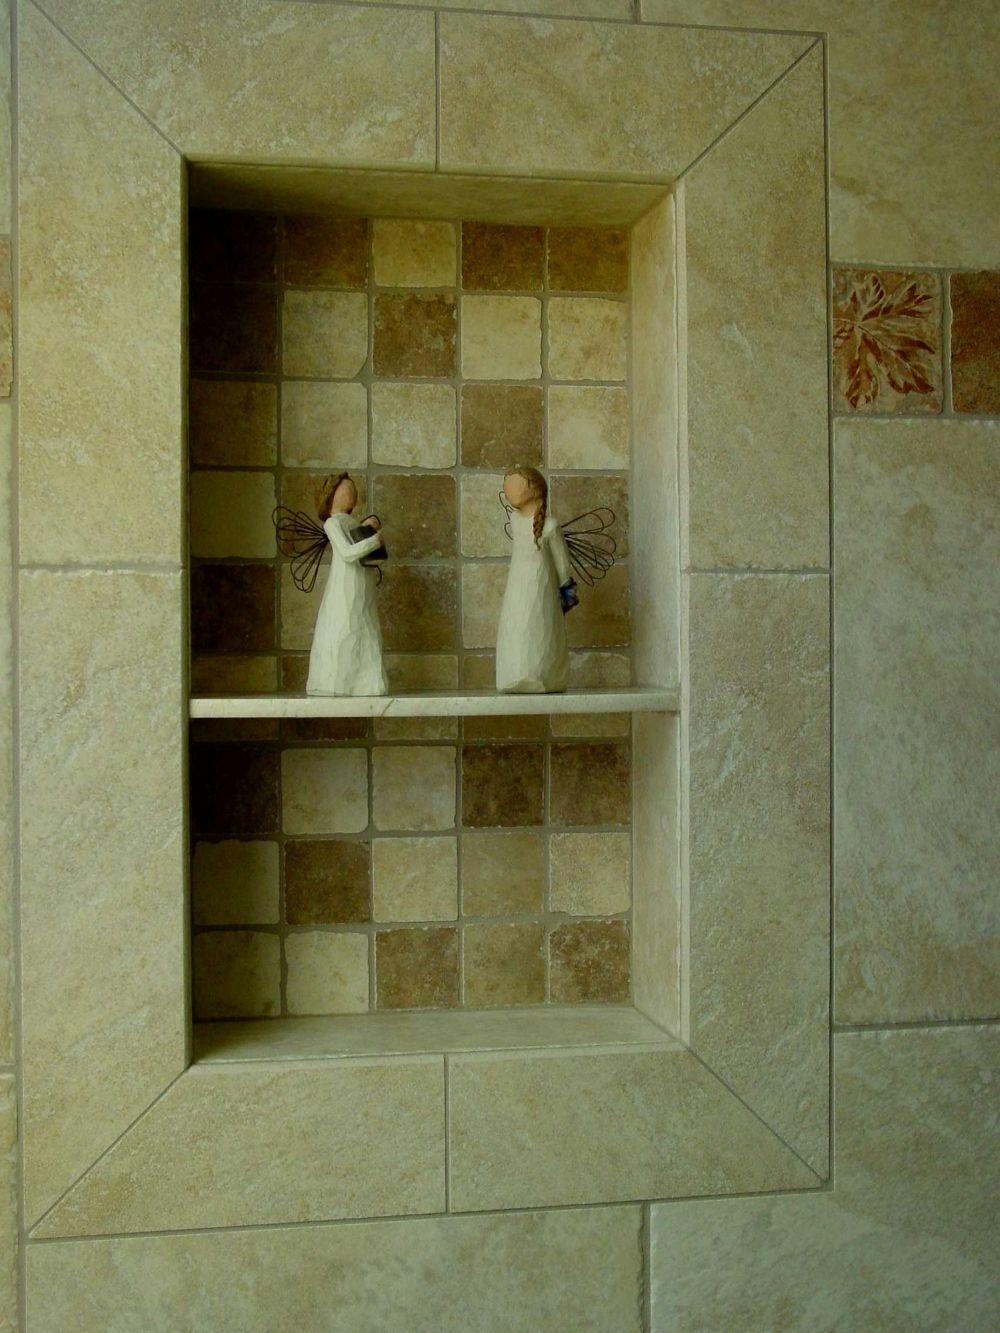 best of bathroom design ideas online-Amazing Bathroom Design Ideas Model